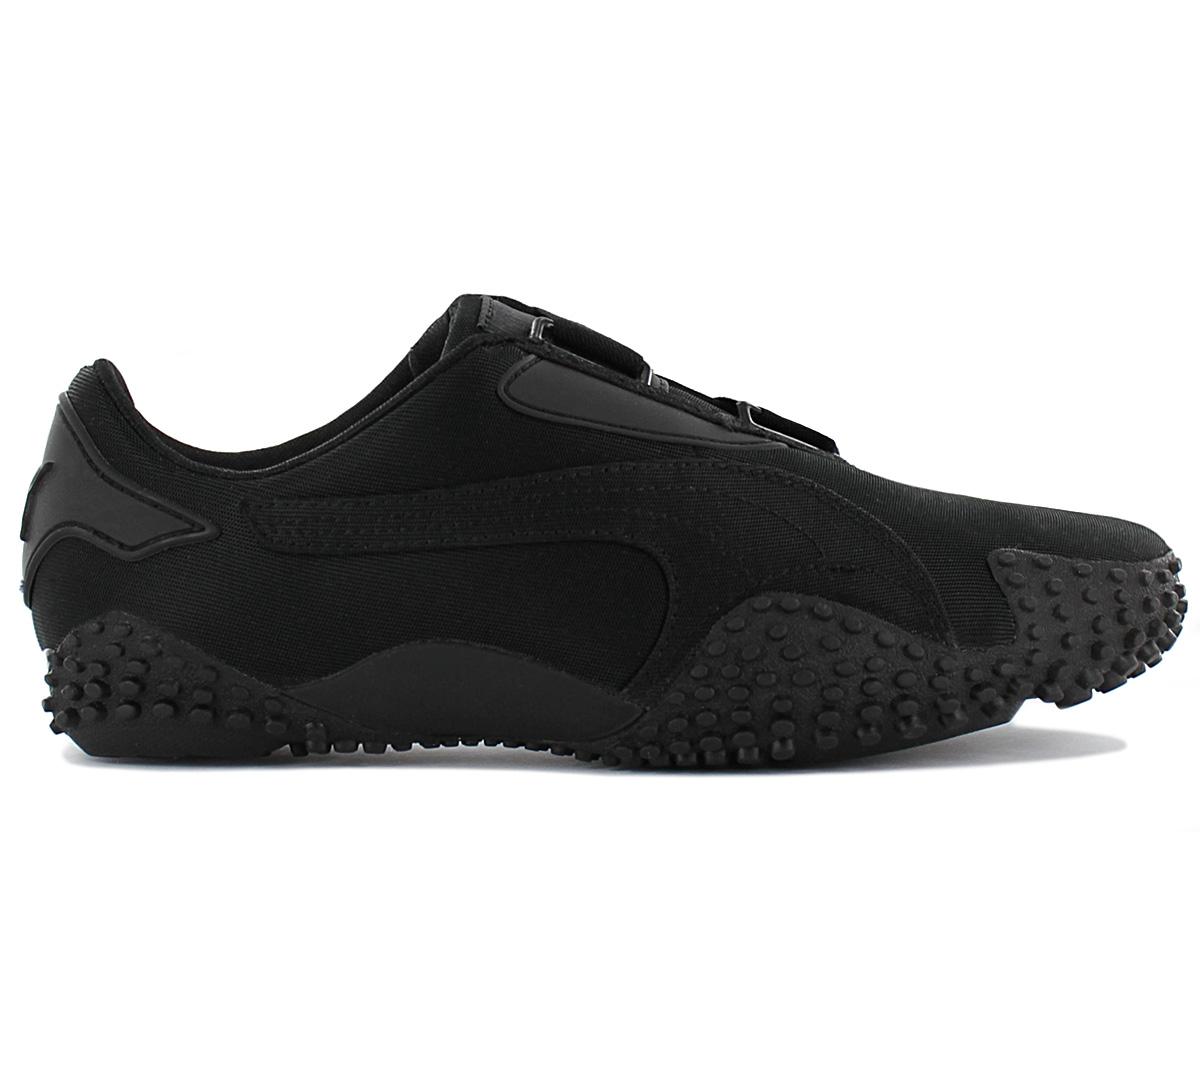 NEUF PUMA MOSTRO OG 363069 01 Femmes Baskets Chaussures